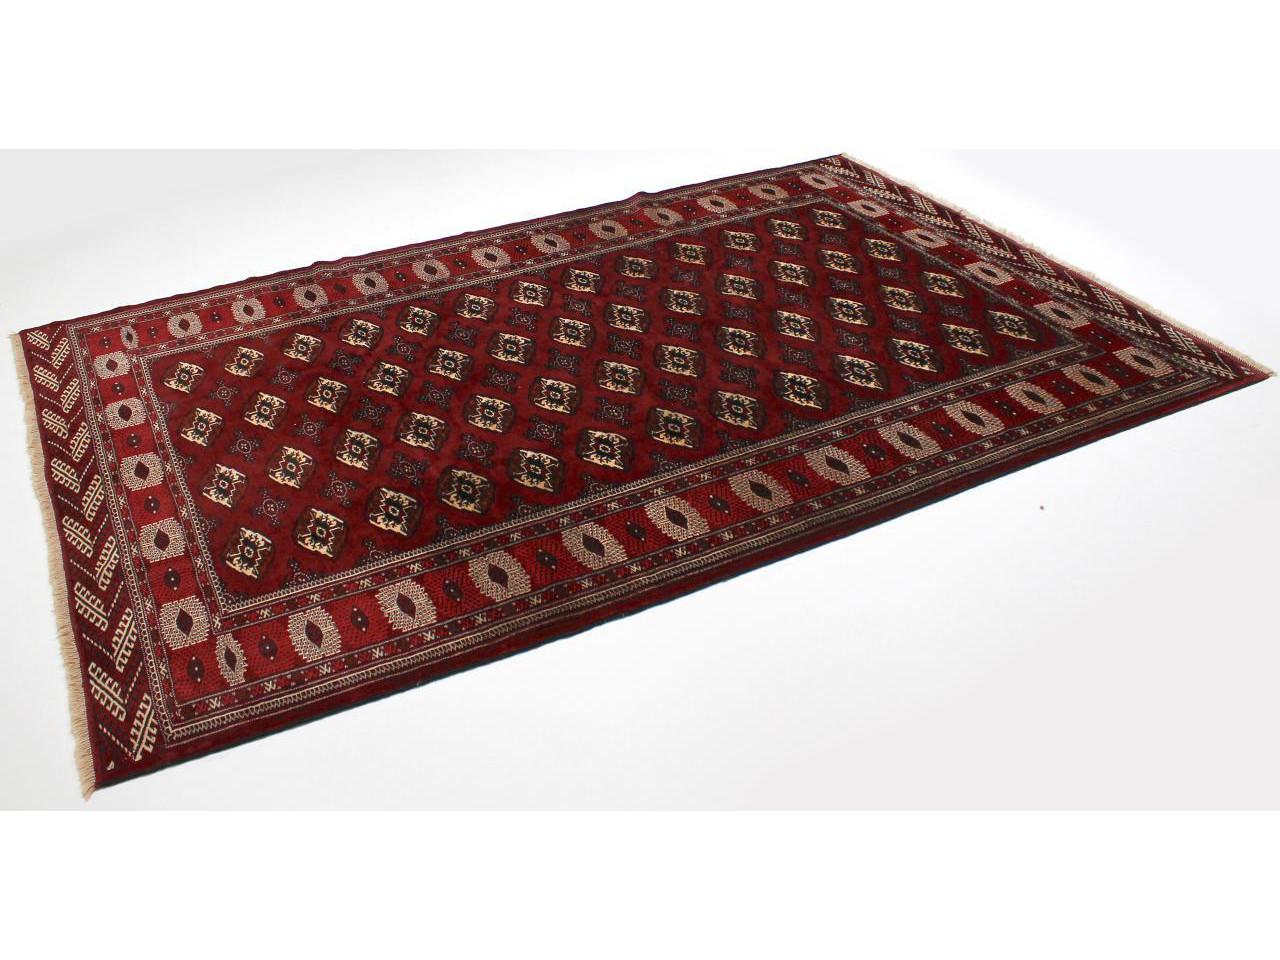 turkm ne tapis persans n 4737 339x224cm. Black Bedroom Furniture Sets. Home Design Ideas